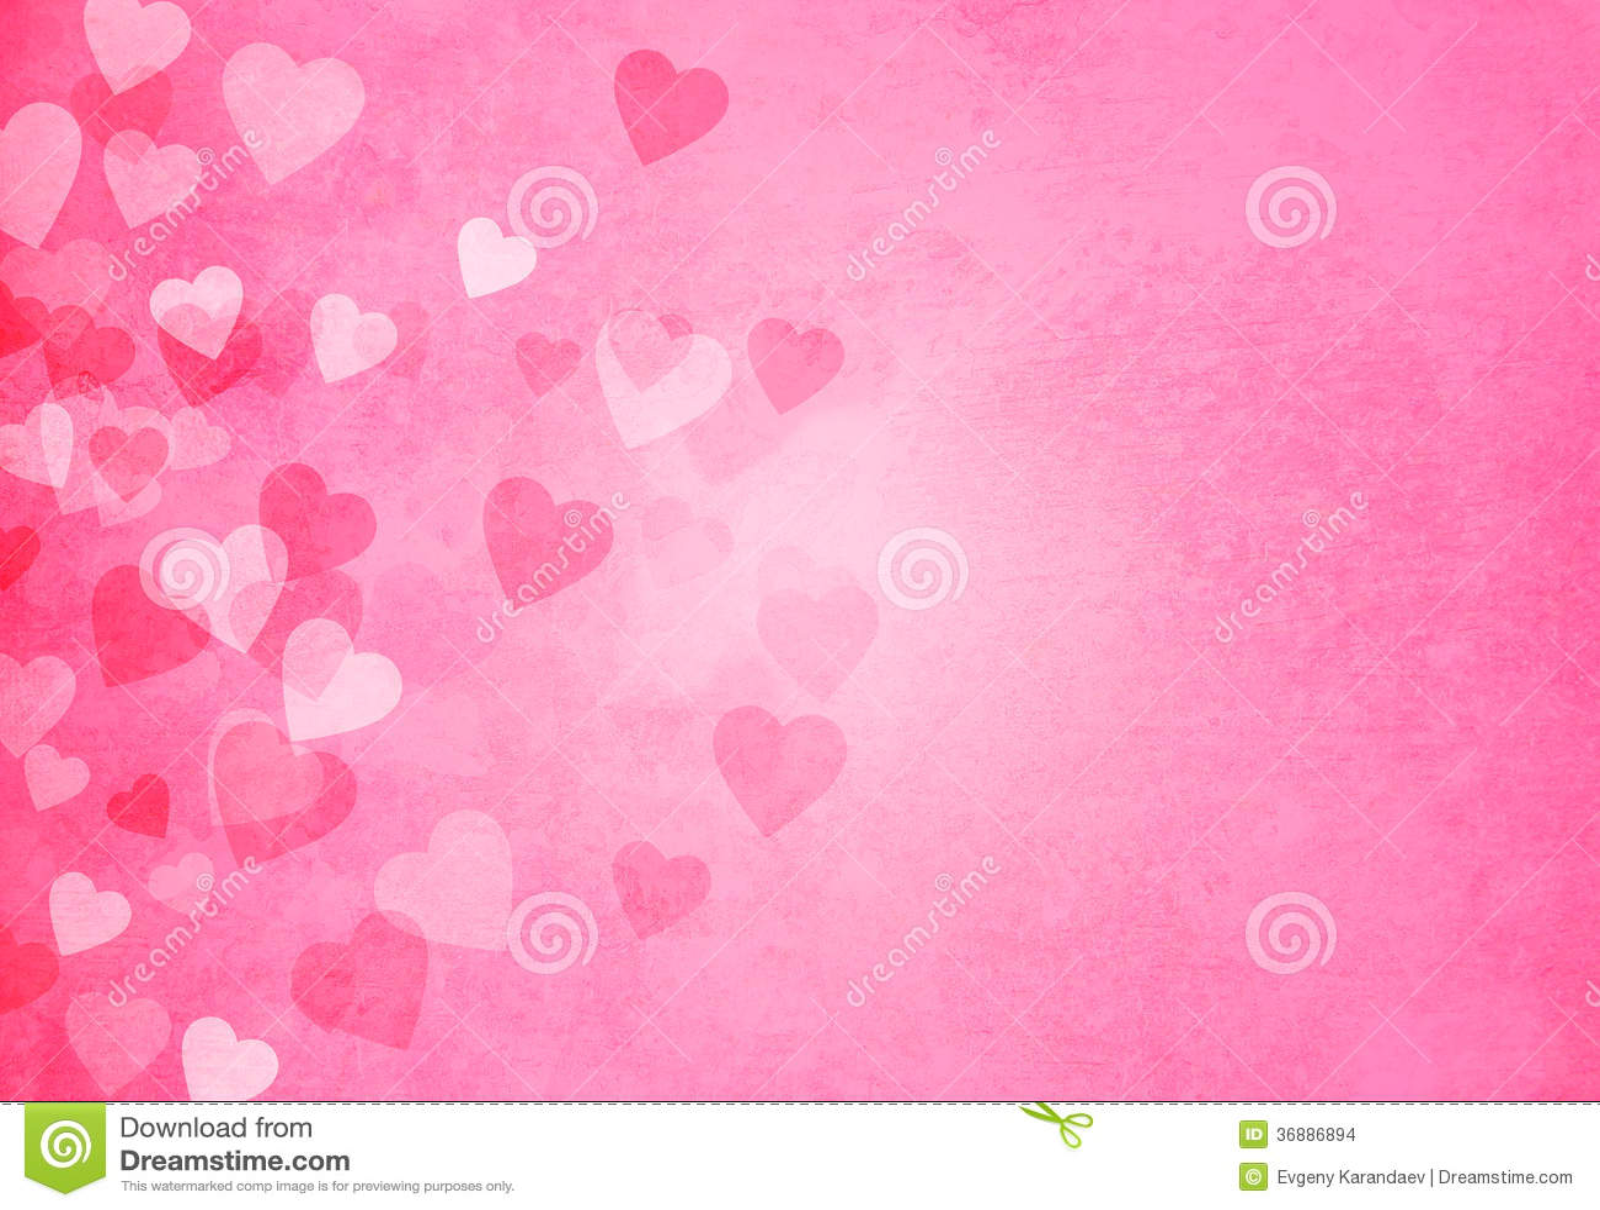 Valentine S Day Pink Hearts Background Illustration 36886894 Megapixl